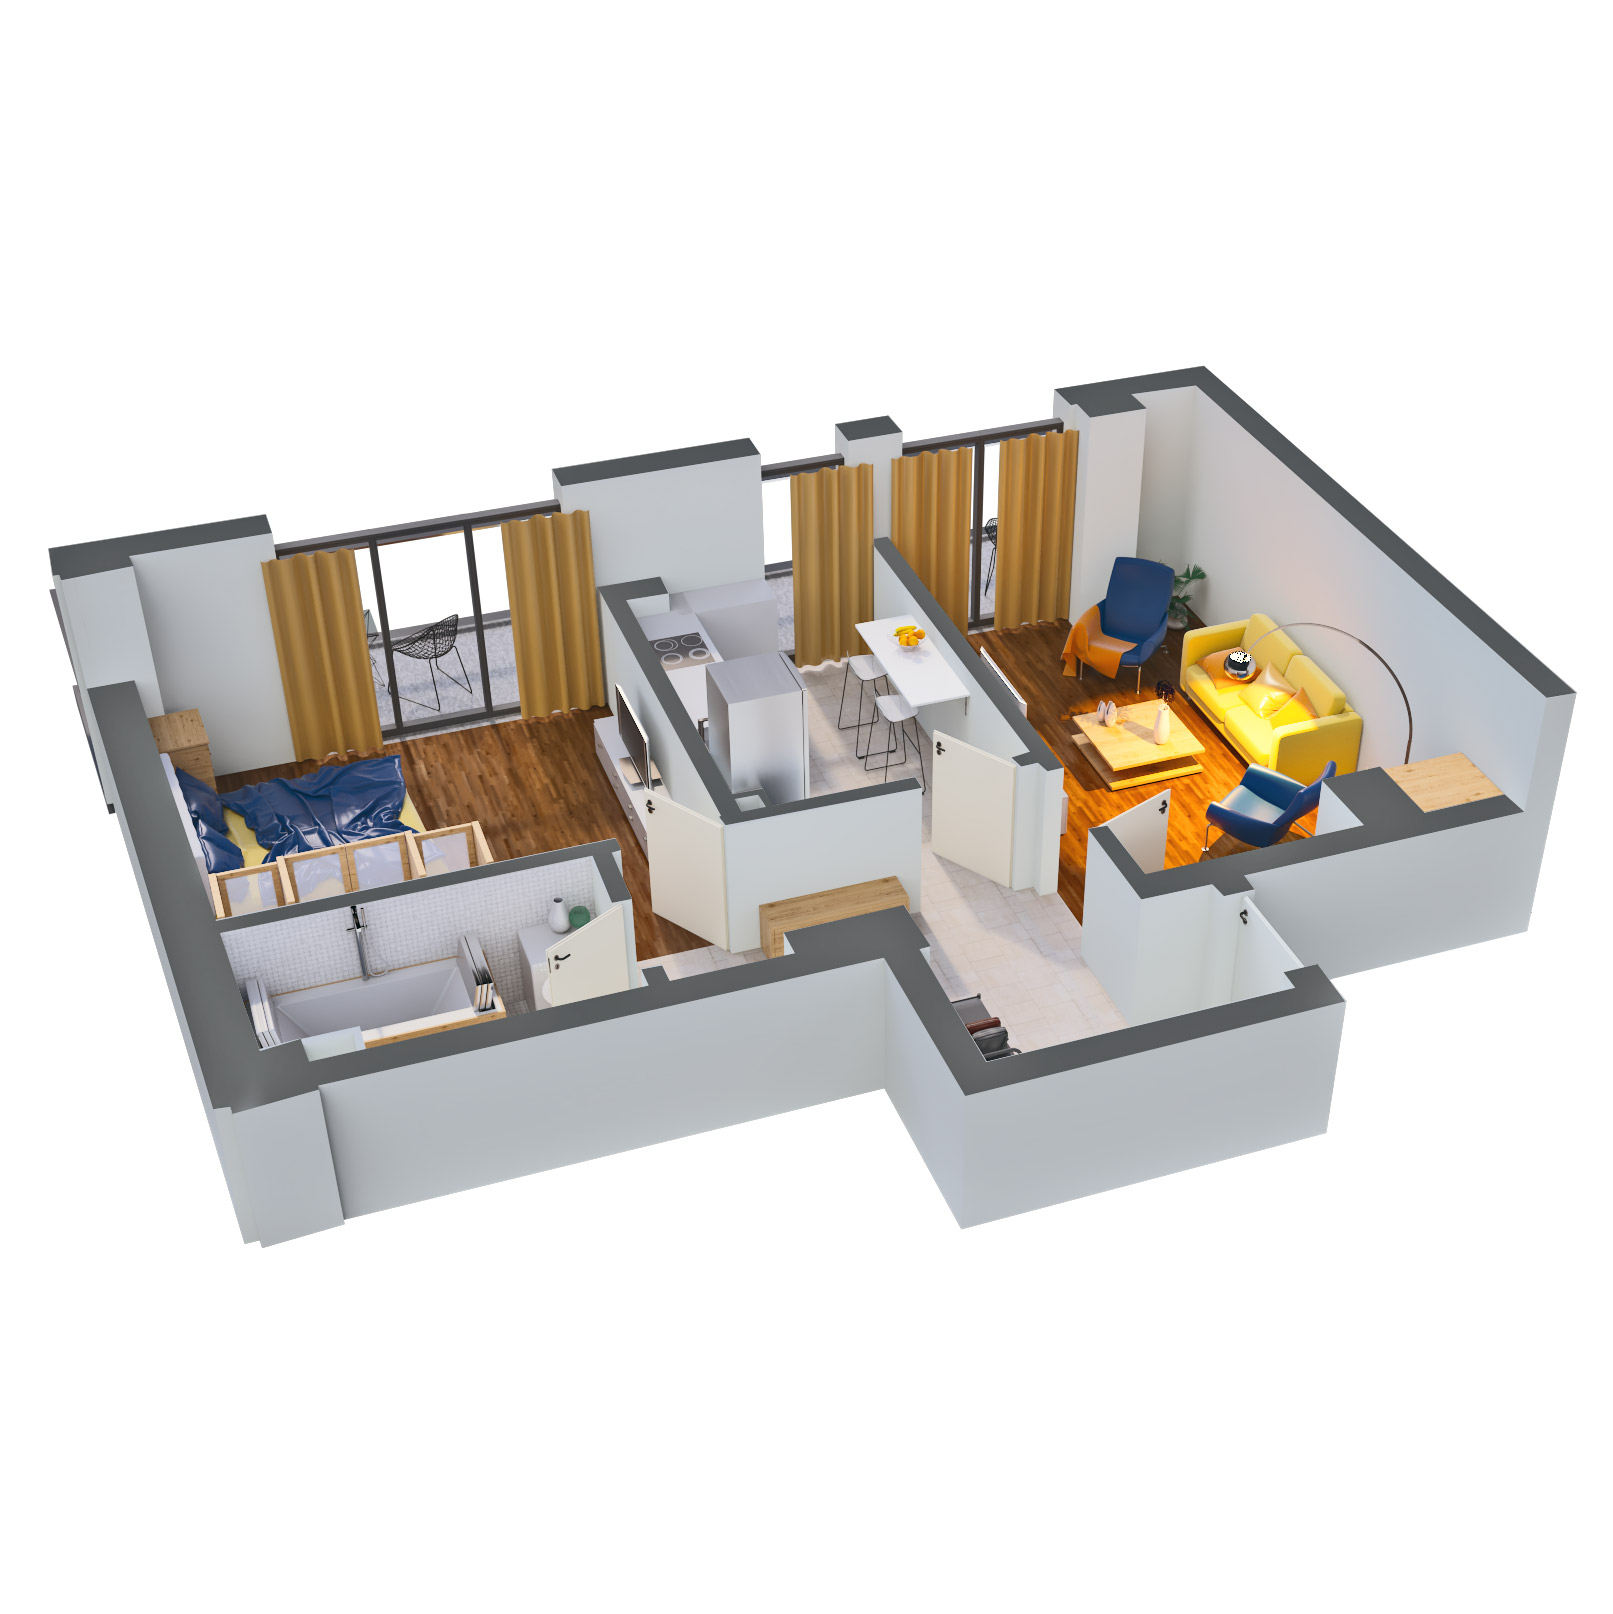 Apartament 2 camere de vanzare Bucuresti - Catedral Residence - Marriott, Piata Unirii, 13 Septembrie, Izvor - Tip 3 - T2 - D